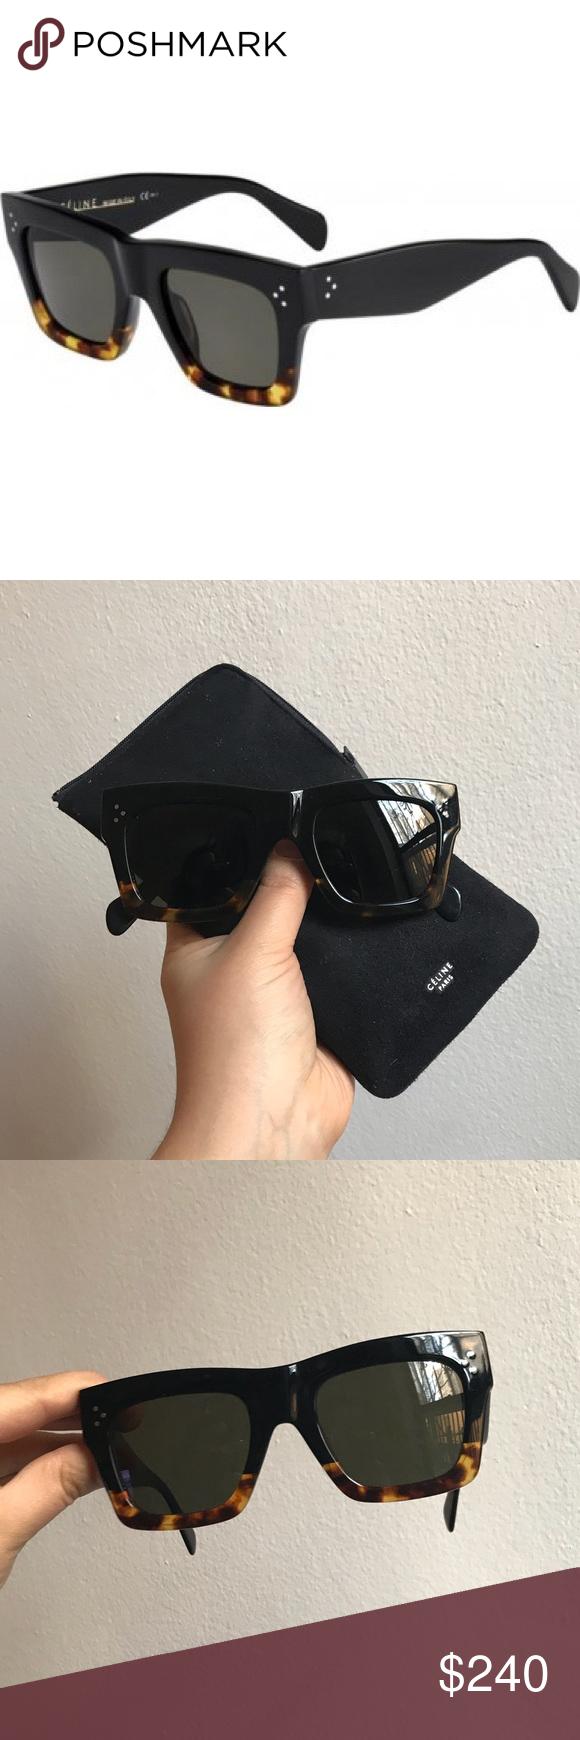 04f28cfbf2 Celine 41054 S Sunglasses Black Havana Tortoise (1E Green Lens). No  scratches